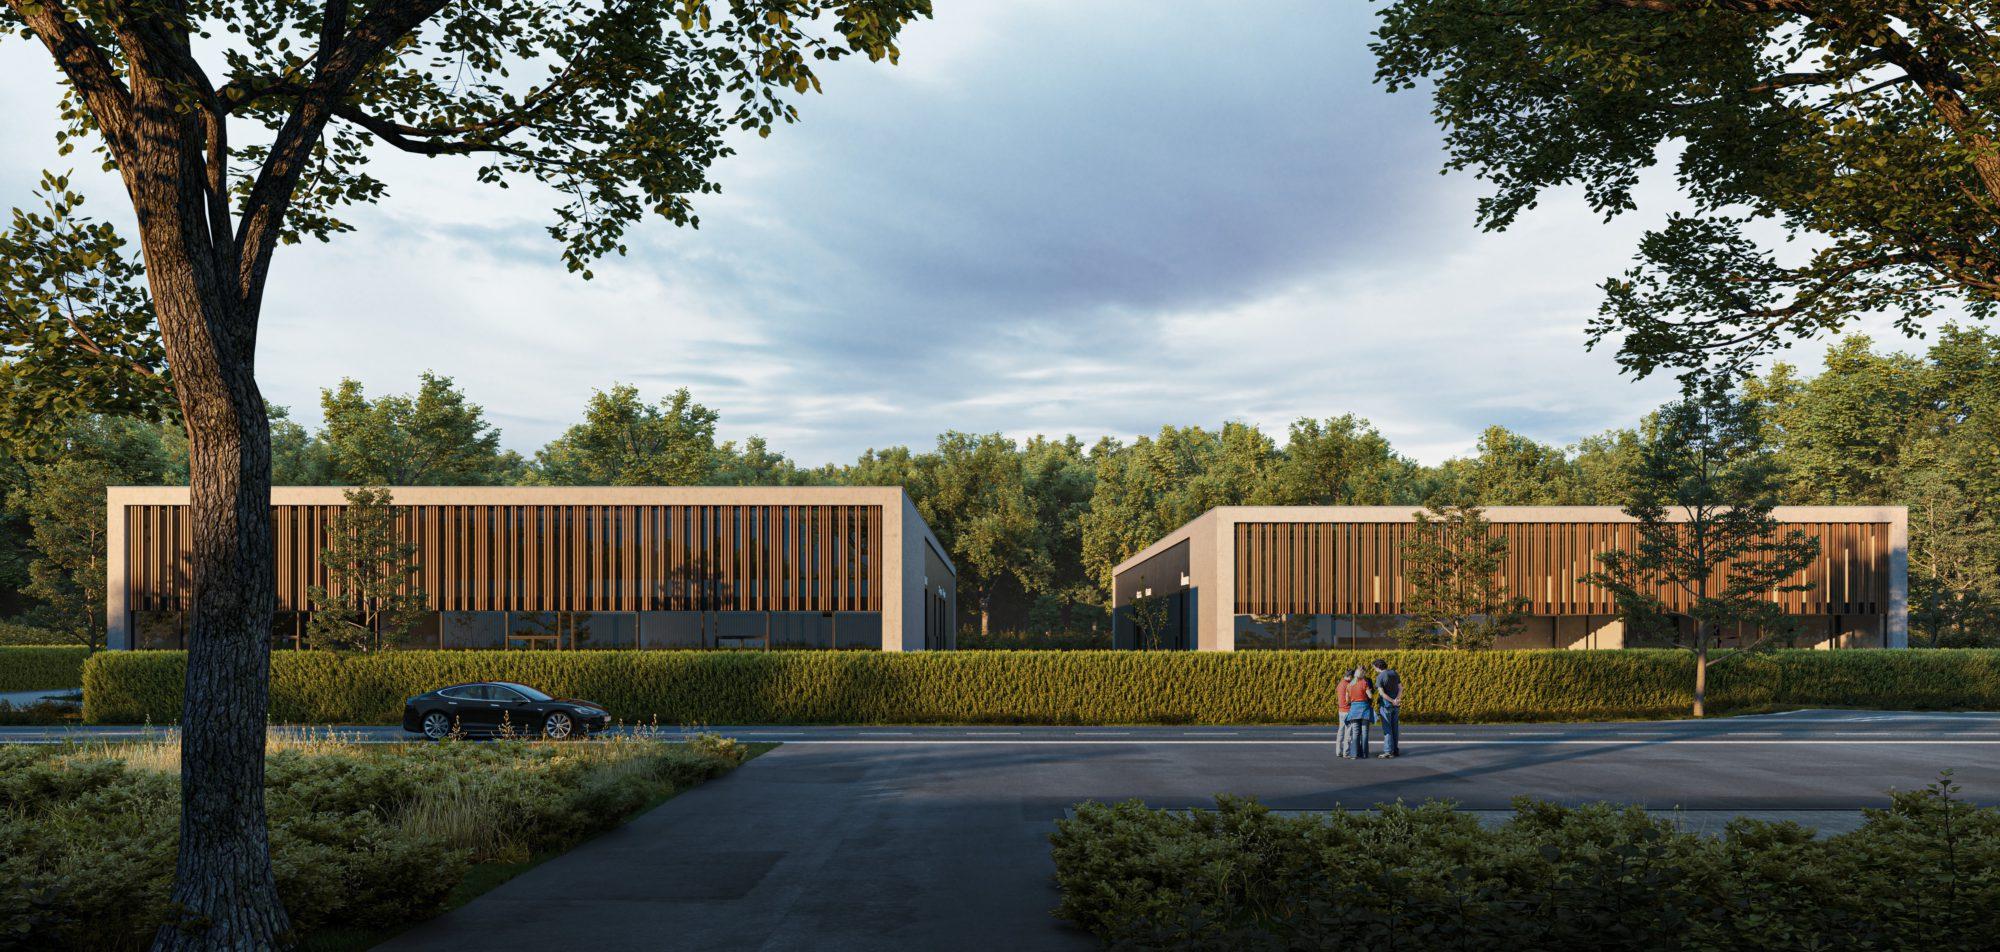 Kolmont BIZ Stadheide KMO tekoop hasselt bedrijvenpark